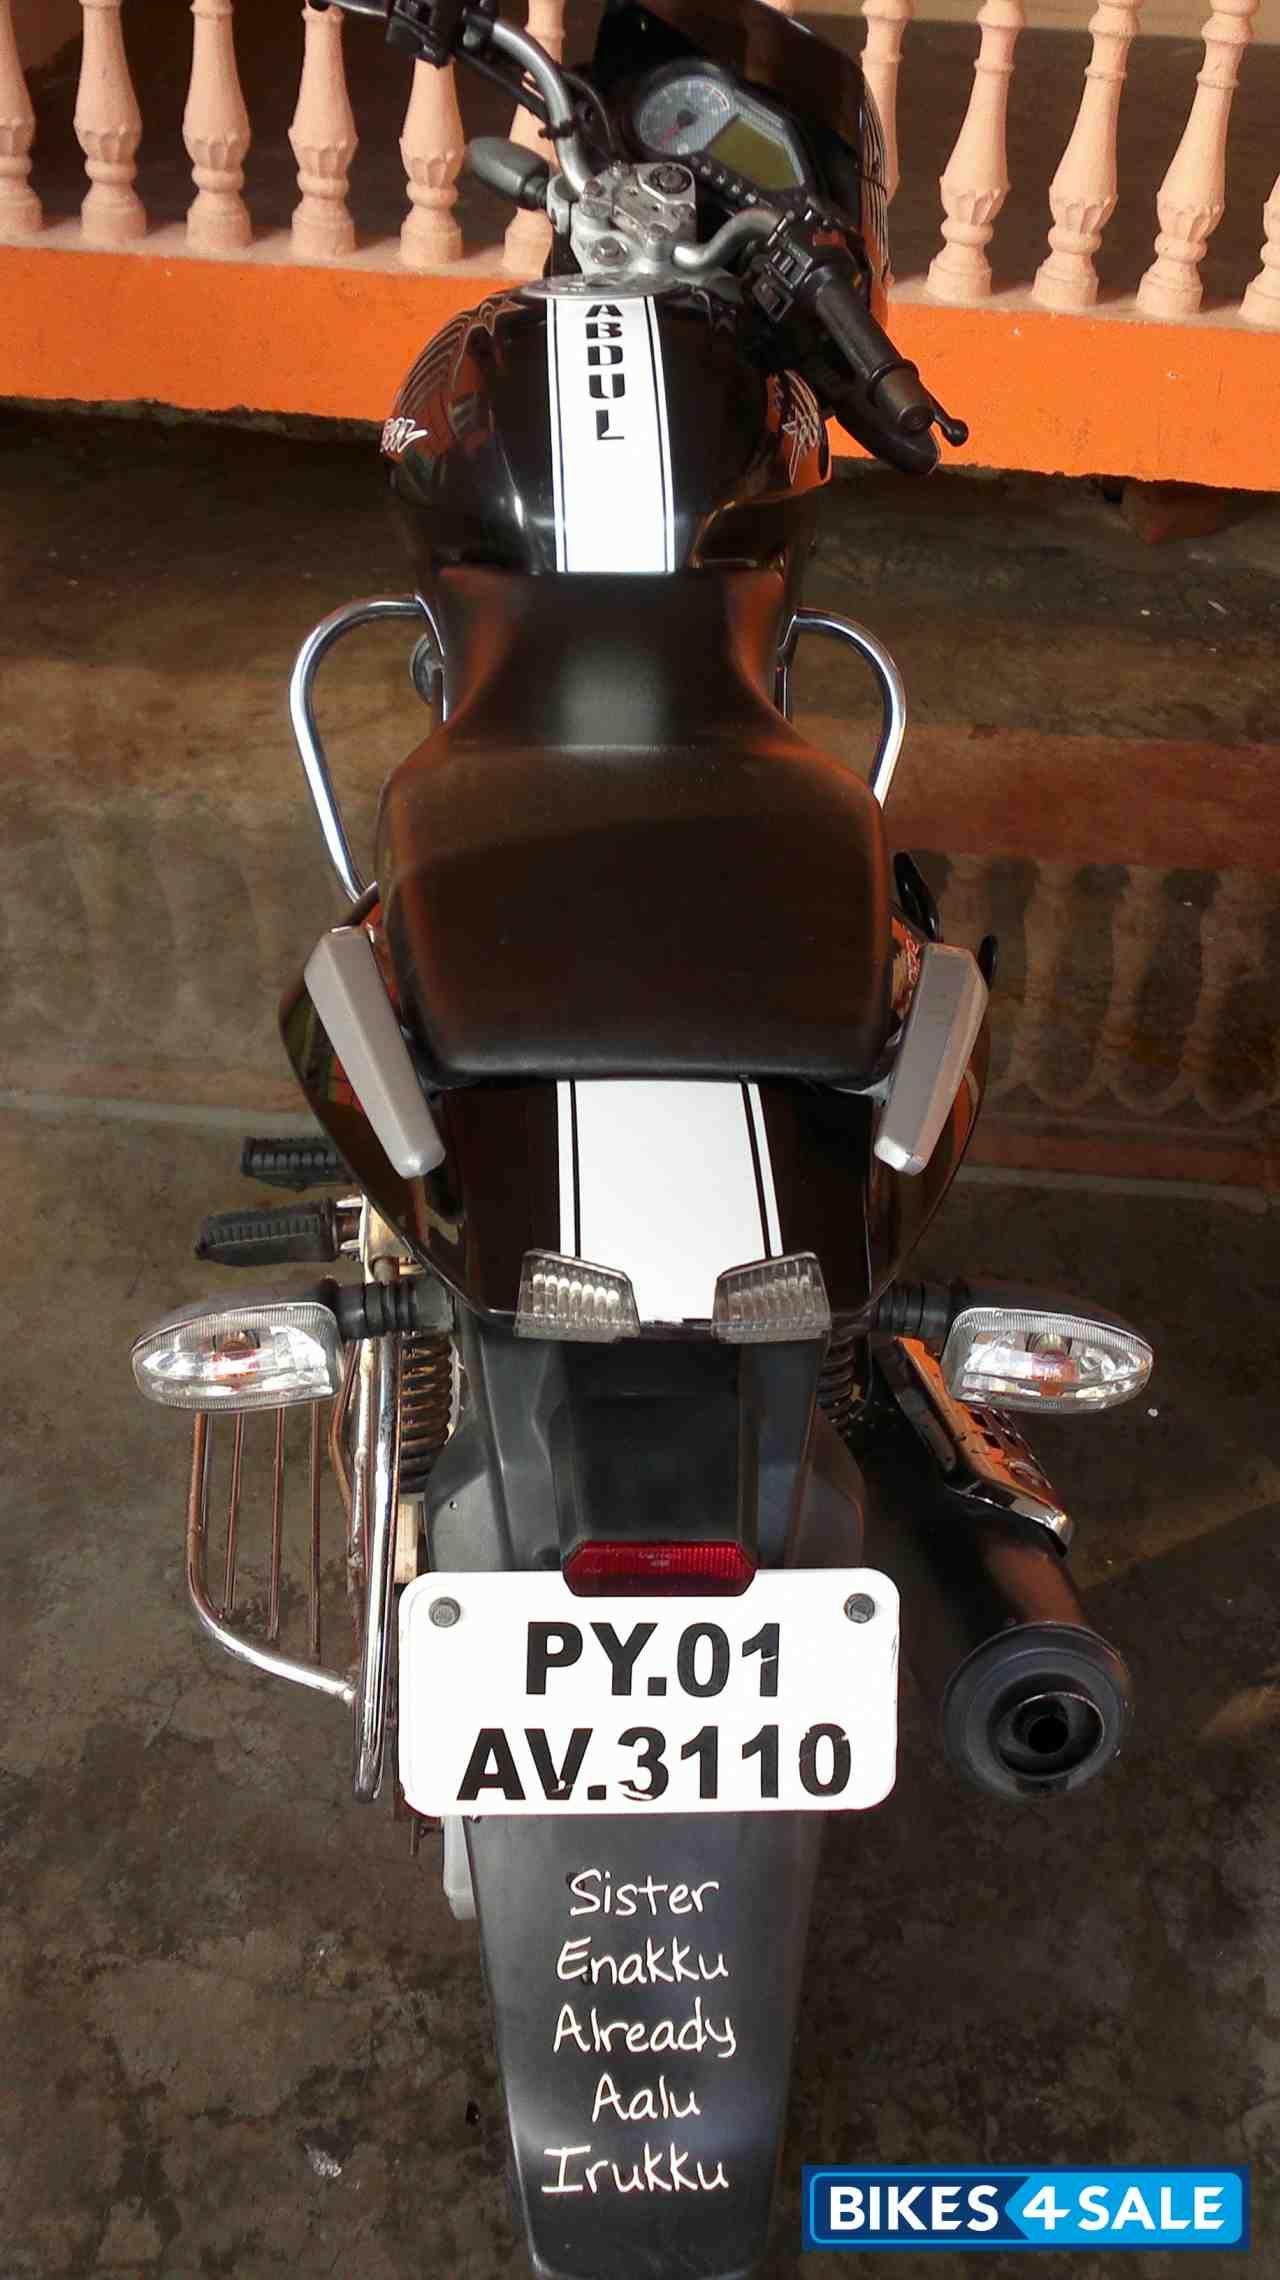 Black Bajaj Pulsar 150 Dtsi Picture 1 Bike Id 110162 Bike Located In Karaikal Bikes4sale